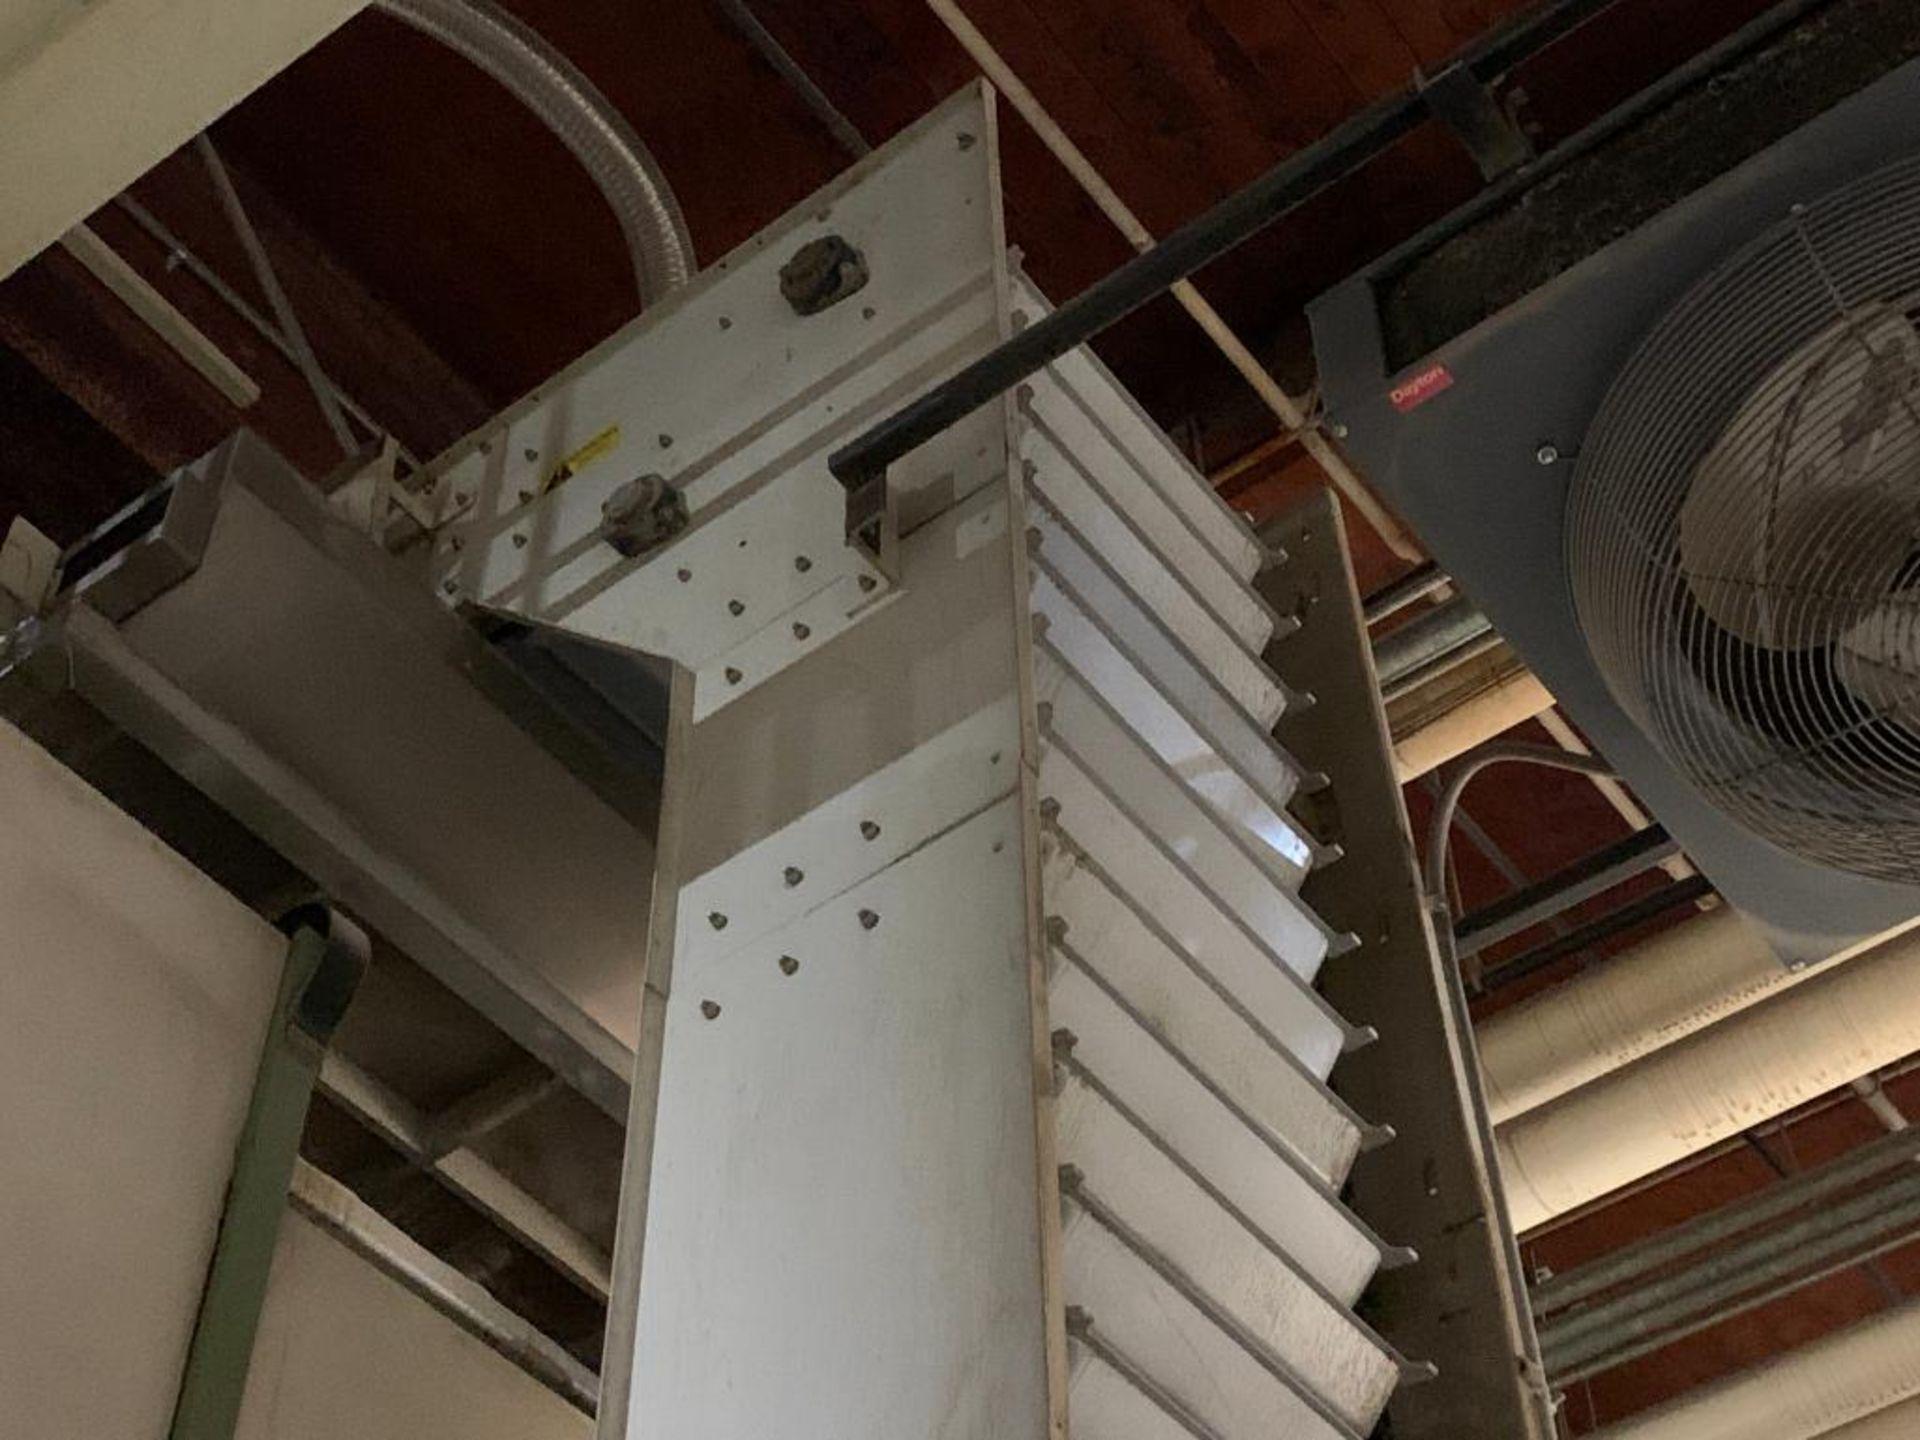 Meyer overlapping bucket elevator, model PA462-24-S - Image 4 of 13